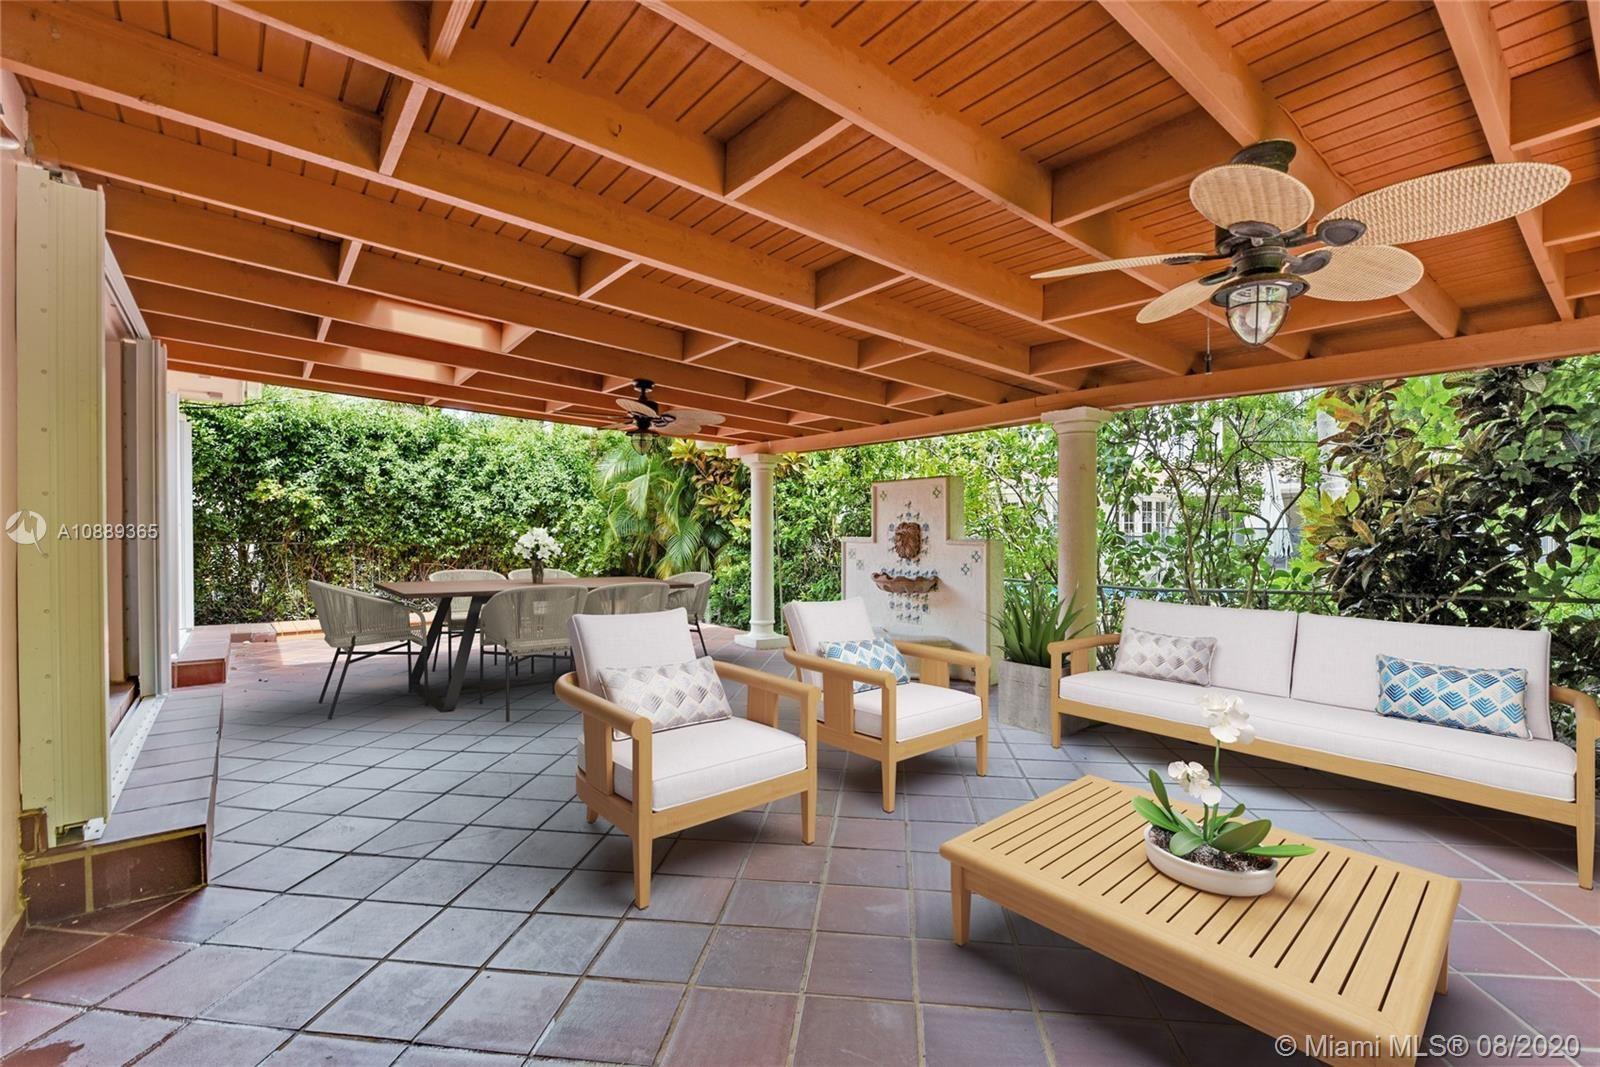 1519 Sarria Ave, Coral Gables, FL 33146 - #: A10889365